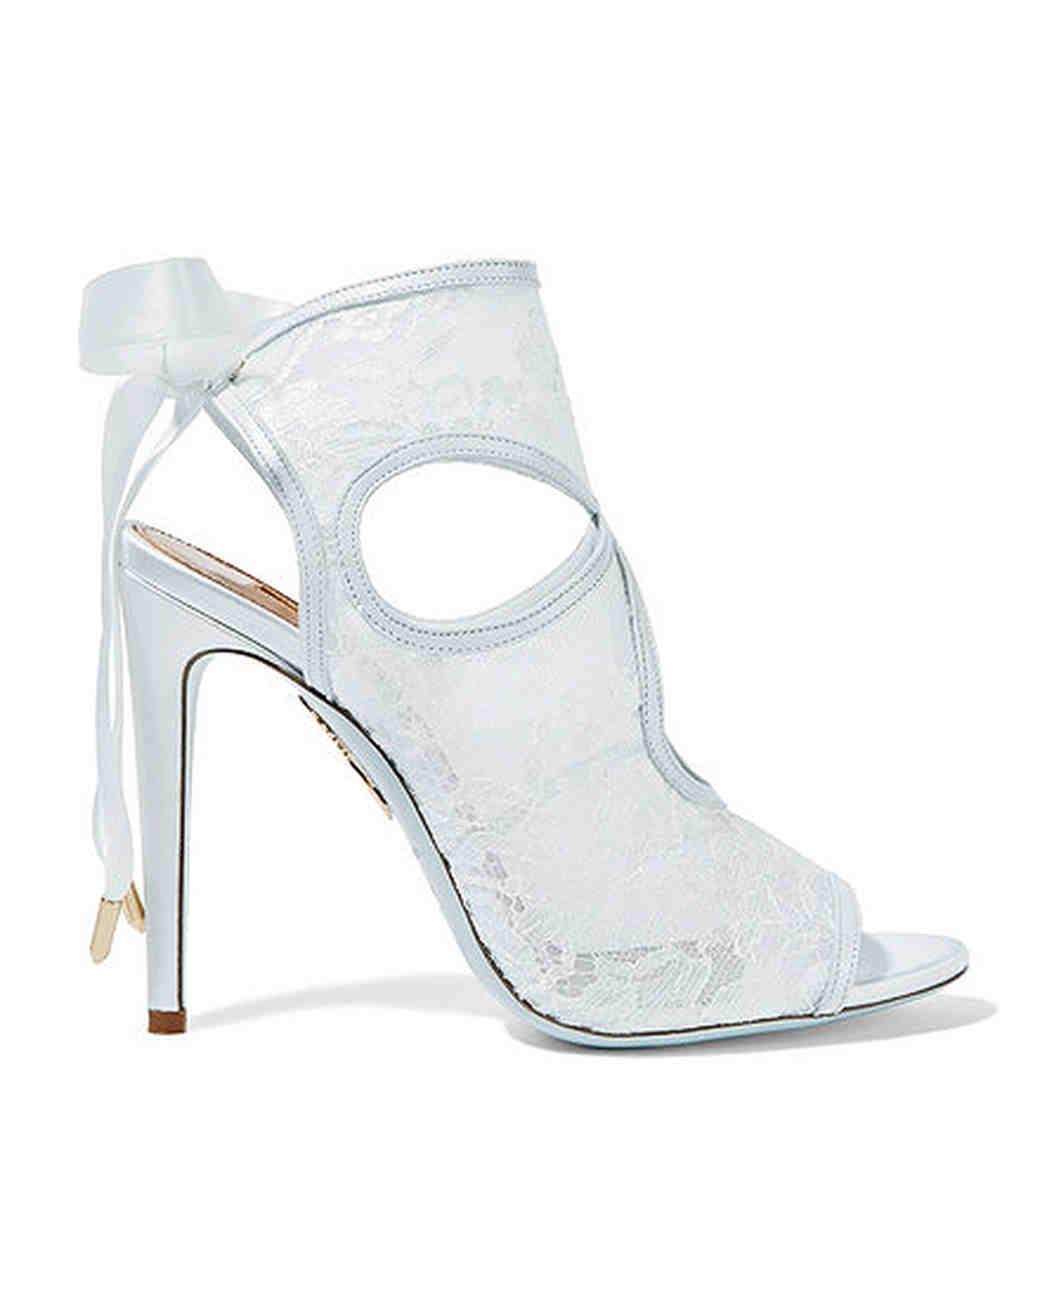 Aquazzura Leather Trimmed Cutout Lace Sandals